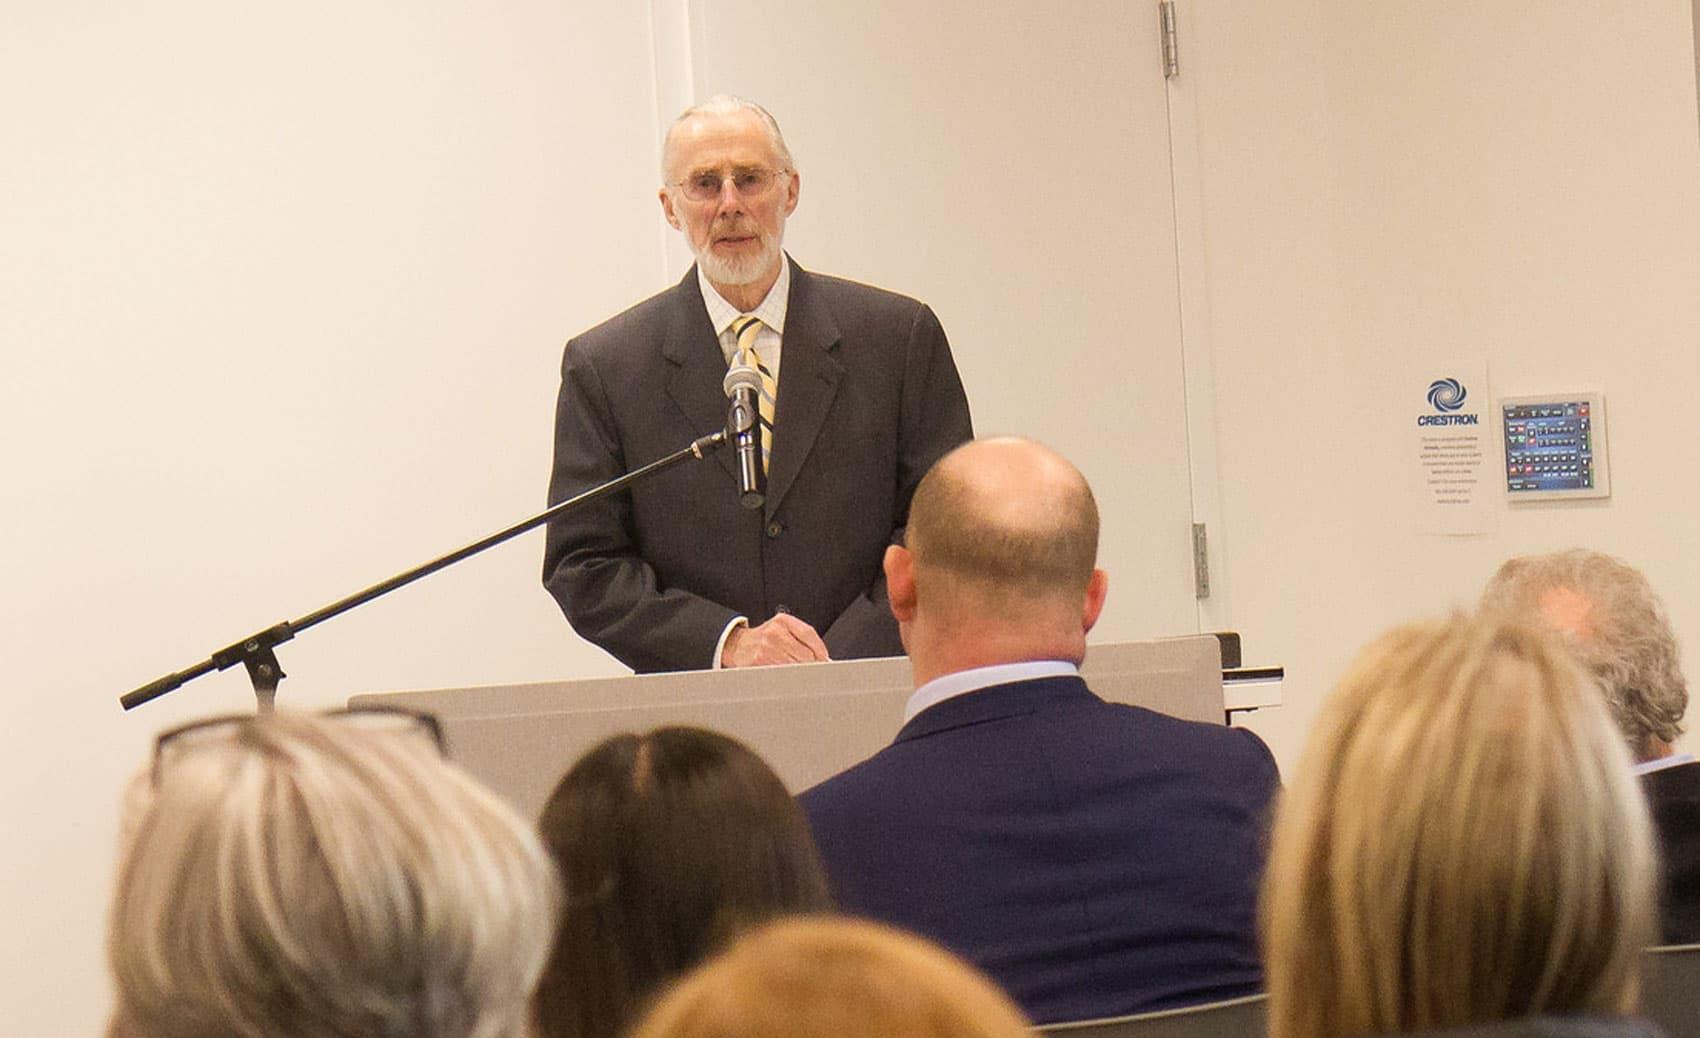 Donald Farish, president of Roger Williams University. (Courtesy of Roger Williams University)